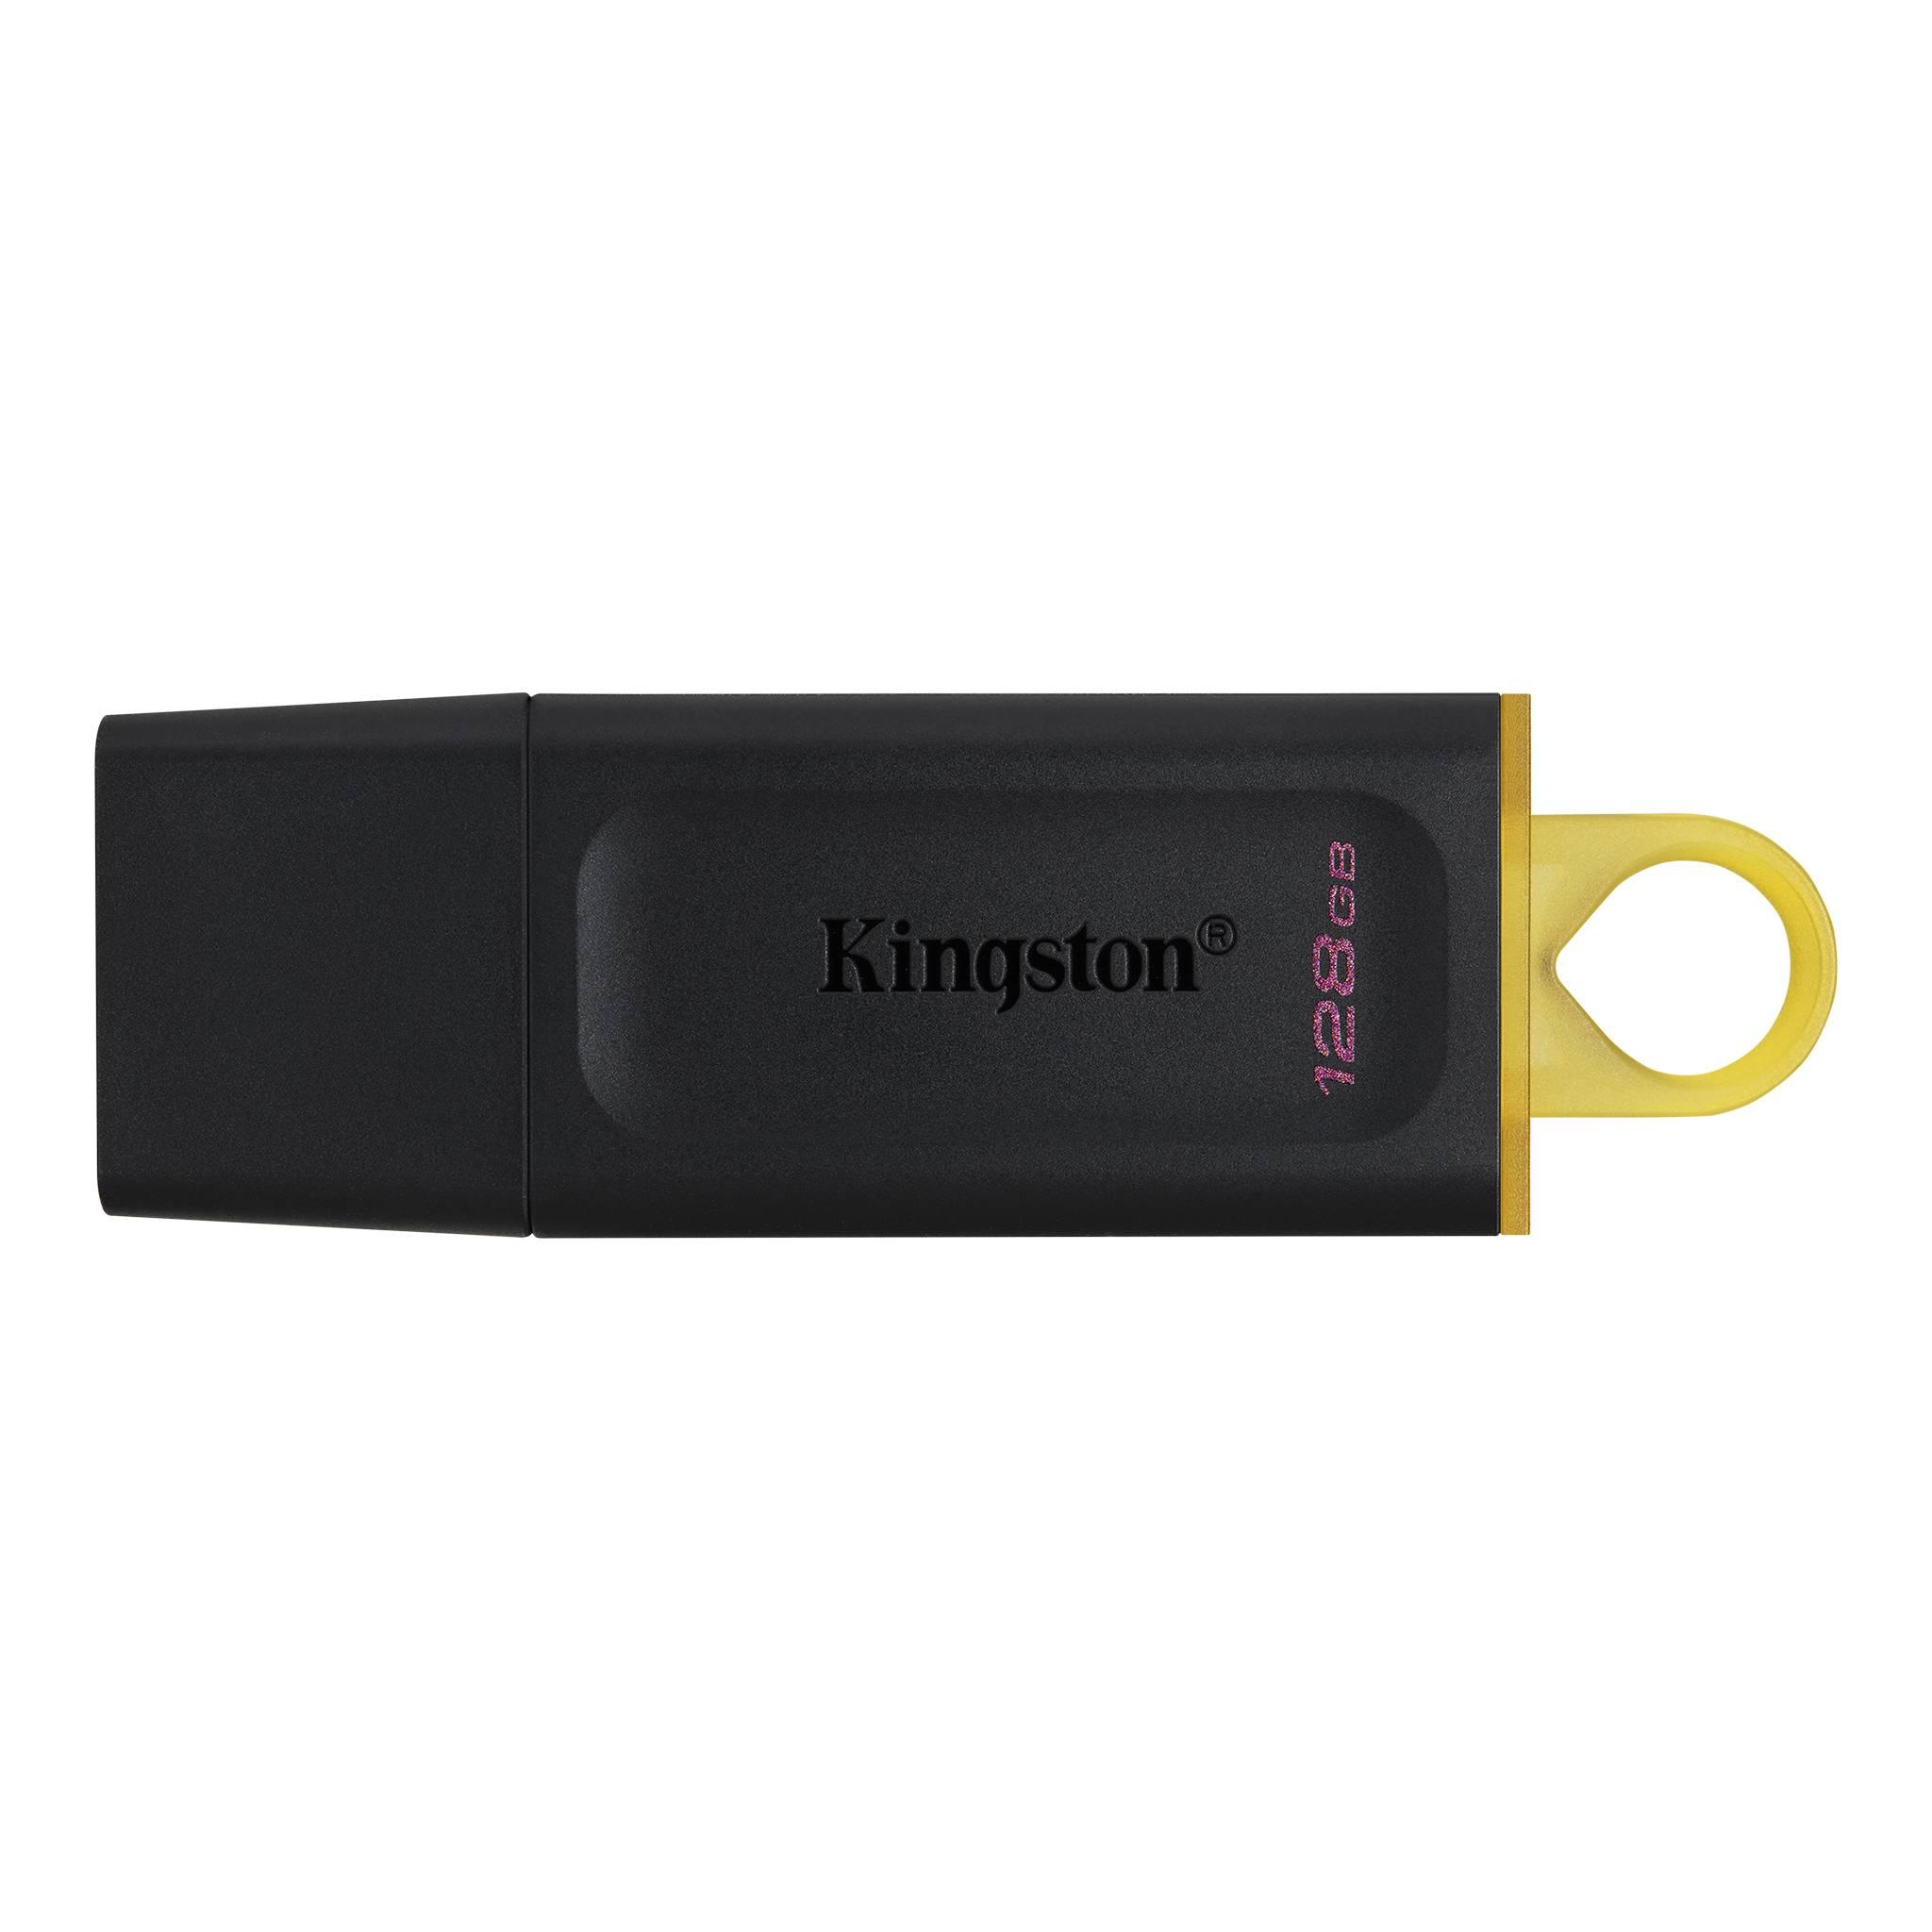 Kingston, 128GB, USB3.0, Flash, Drive, Memory, Stick, Thumb, Key, DataTraveler, DT100G3, Retail, Pack, 5yrs, warranty, ~USK-DT100G3-128,